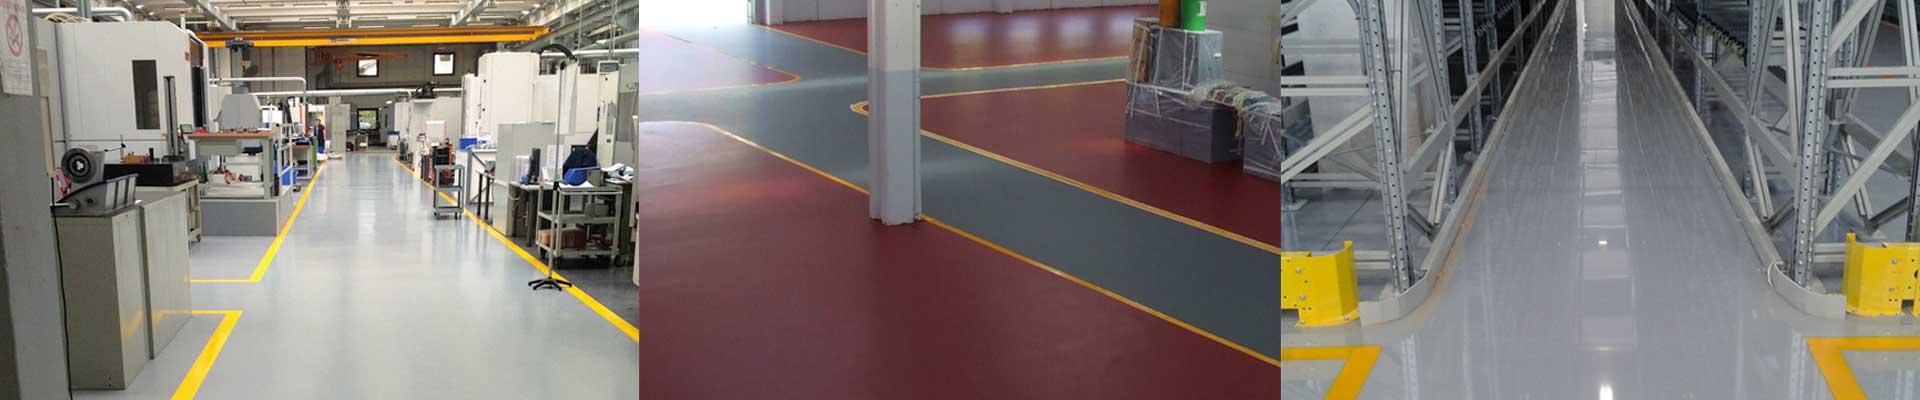 Resin System pavimentazioni